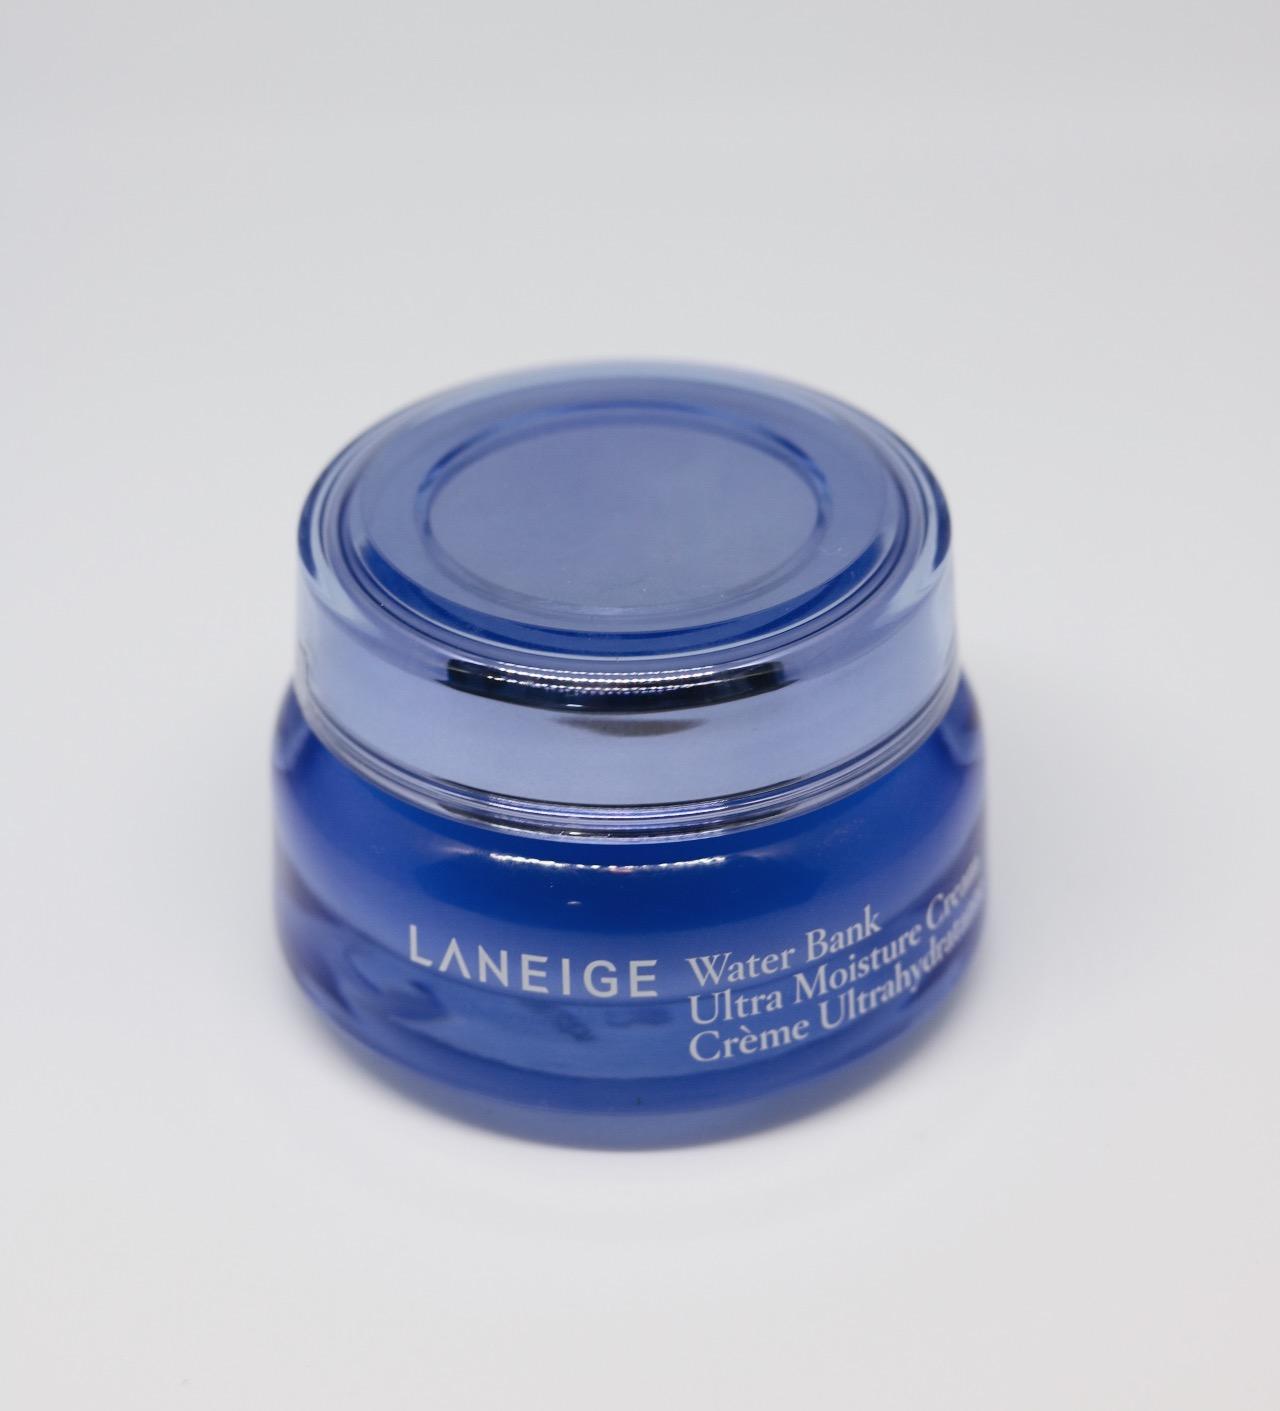 laneige water bank ultra moisture cream brittanylaurens brittany lauren saskatoon blogger canadian fashion beauty